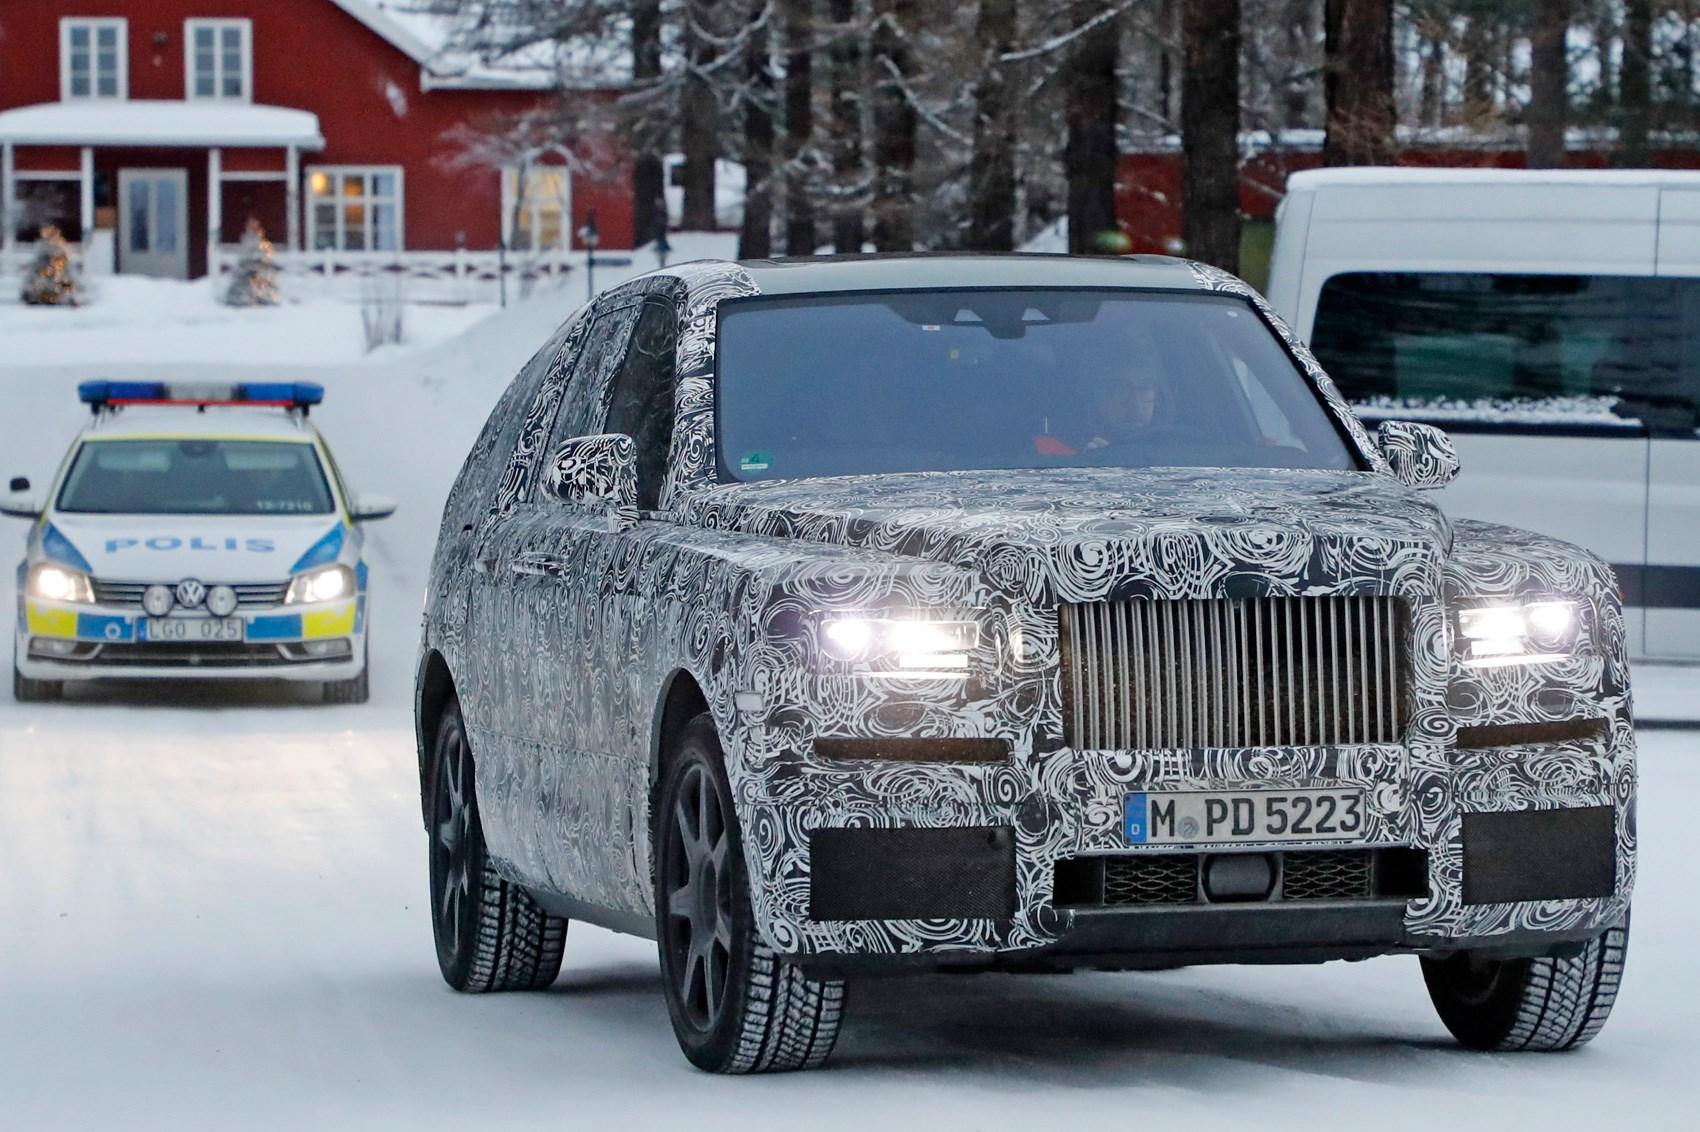 rolls royce cullinan 01 - Rolls-Royce voiture neuve au royaume uni la future Cullinan